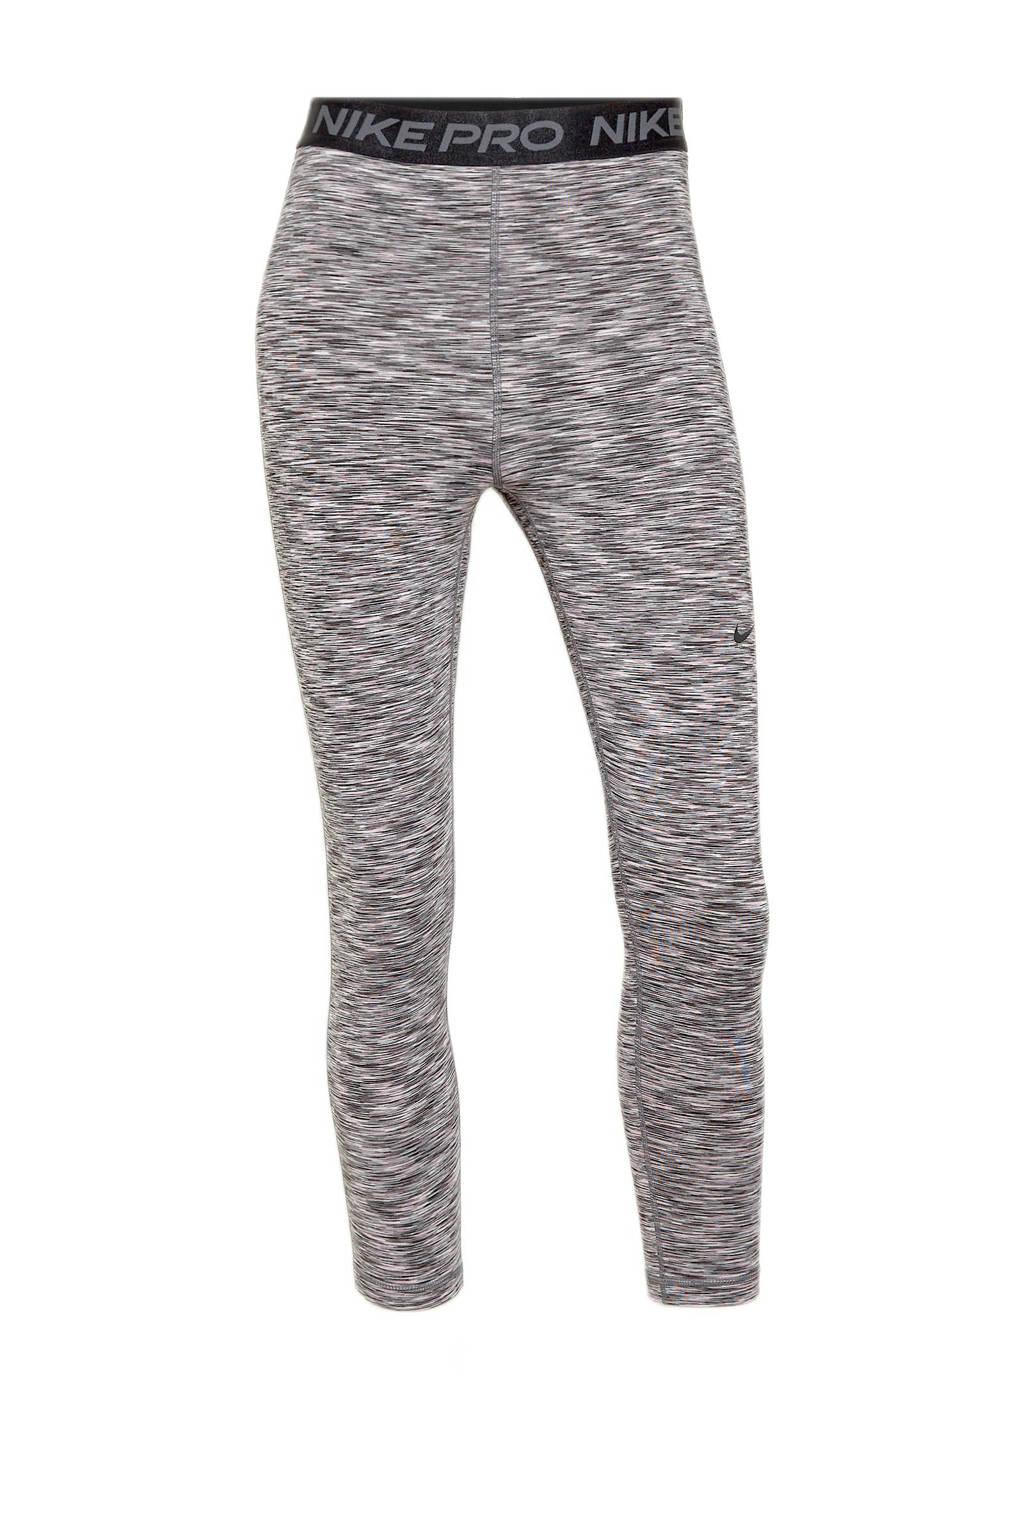 Nike 7/8 sportlegging zwart/grijs, Zwart/grijs